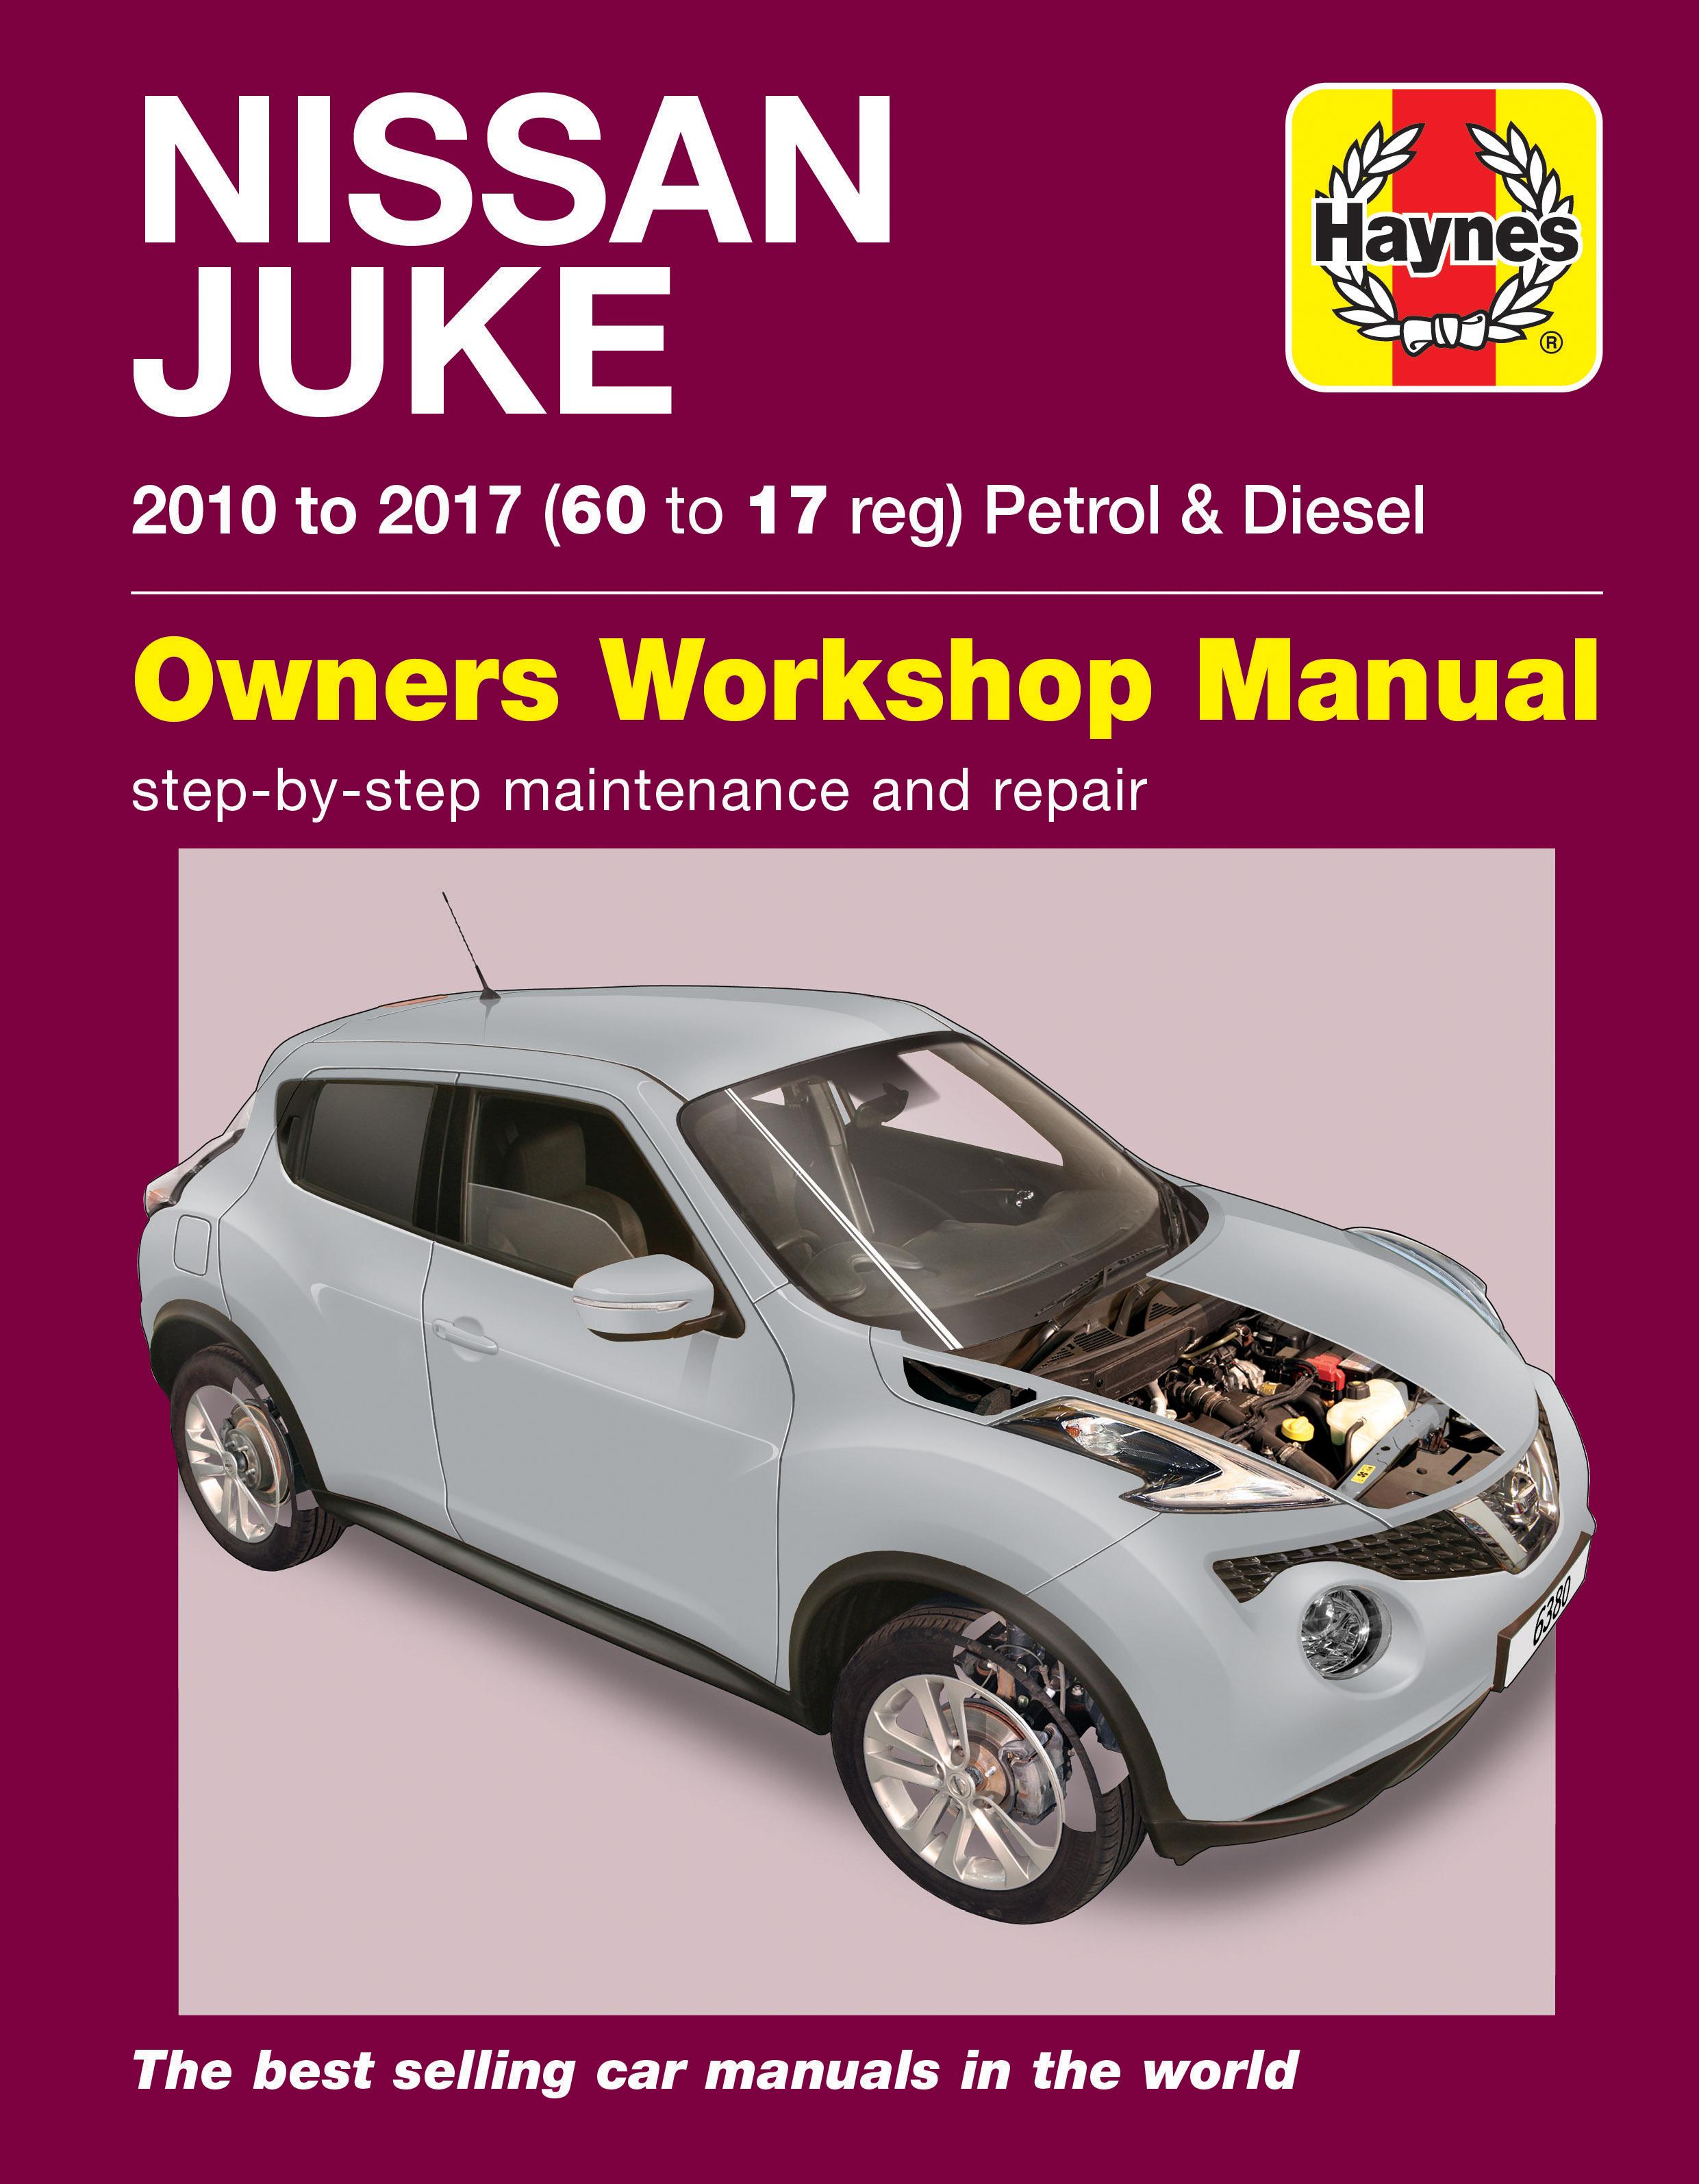 nissan juke wire diagram wiring diagrams Nissan Battery Diagram nissan juke wiring diagram pdf wiring libraryenlarge nissan juke